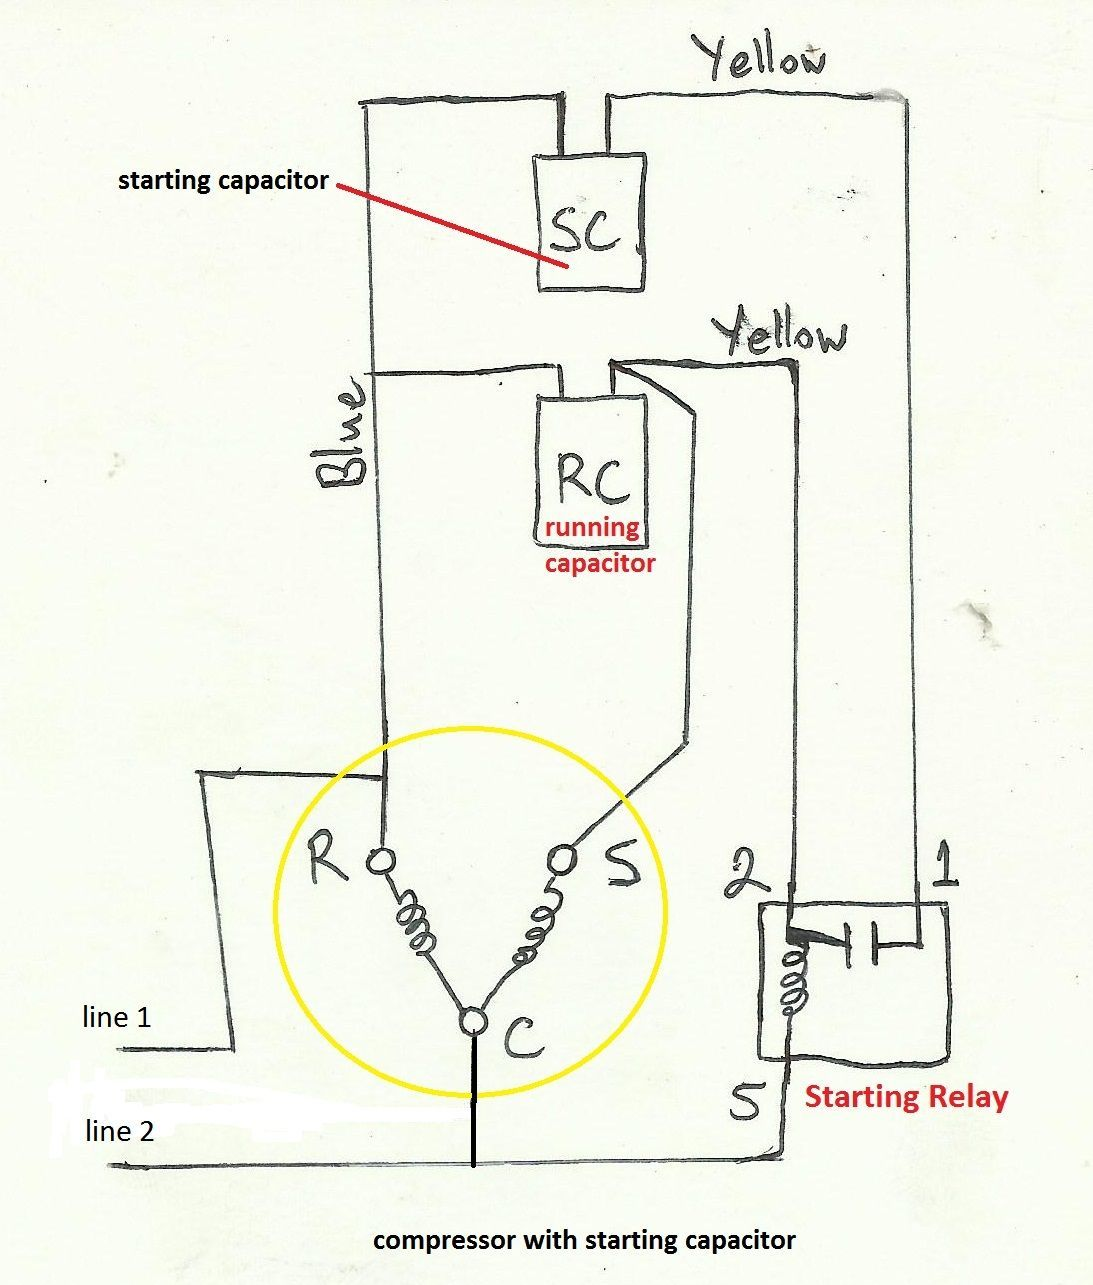 Ac Dual Capacitor Wiring Diagram Electrical Wiring Diagram Capacitors Electrical Circuit Diagram